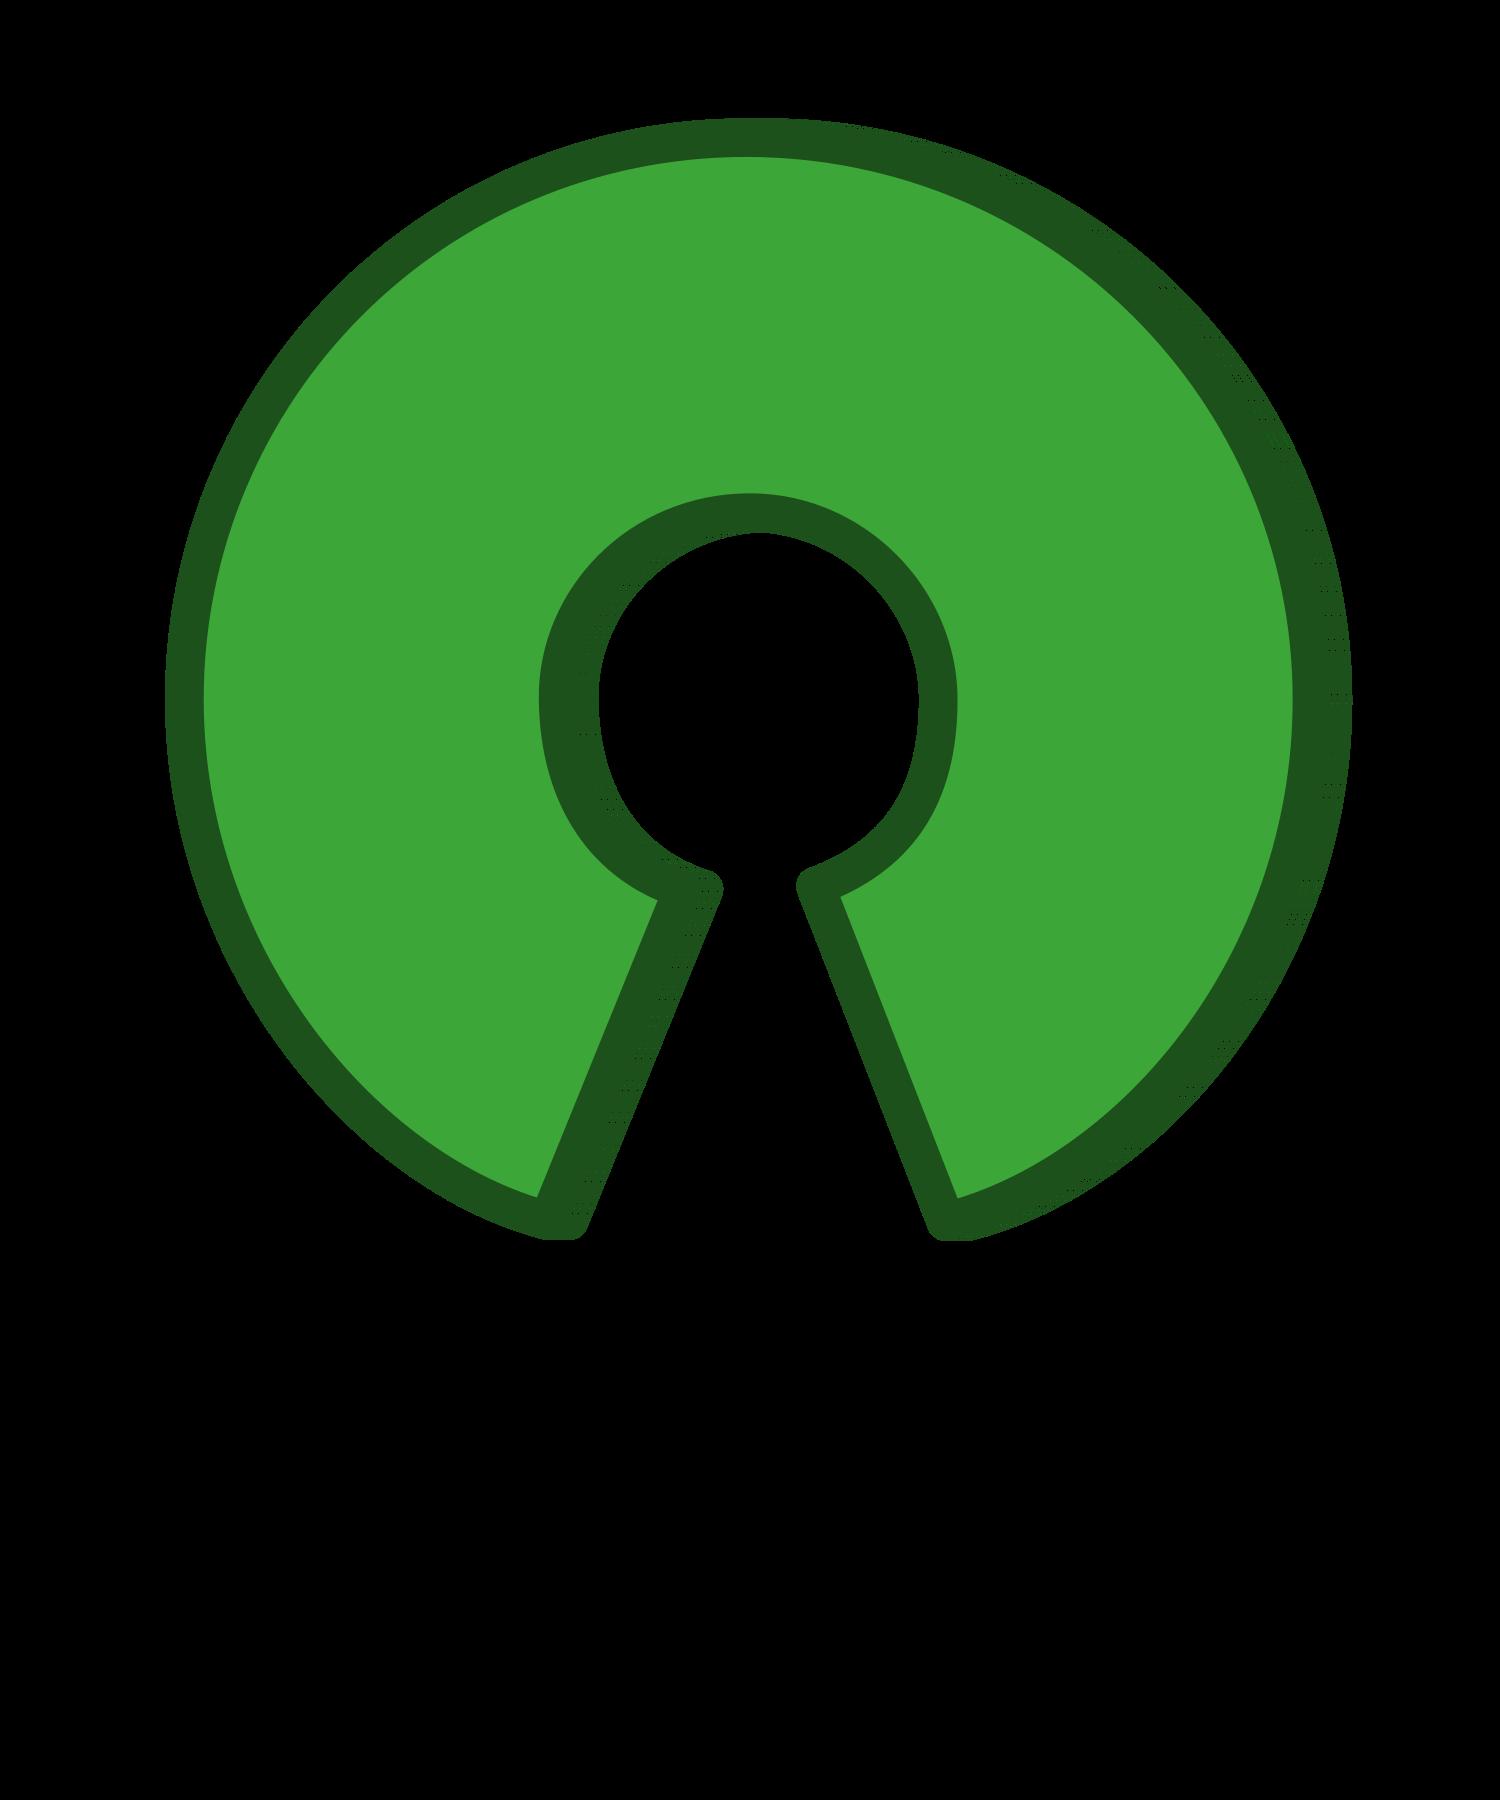 osi_standard_logo_0